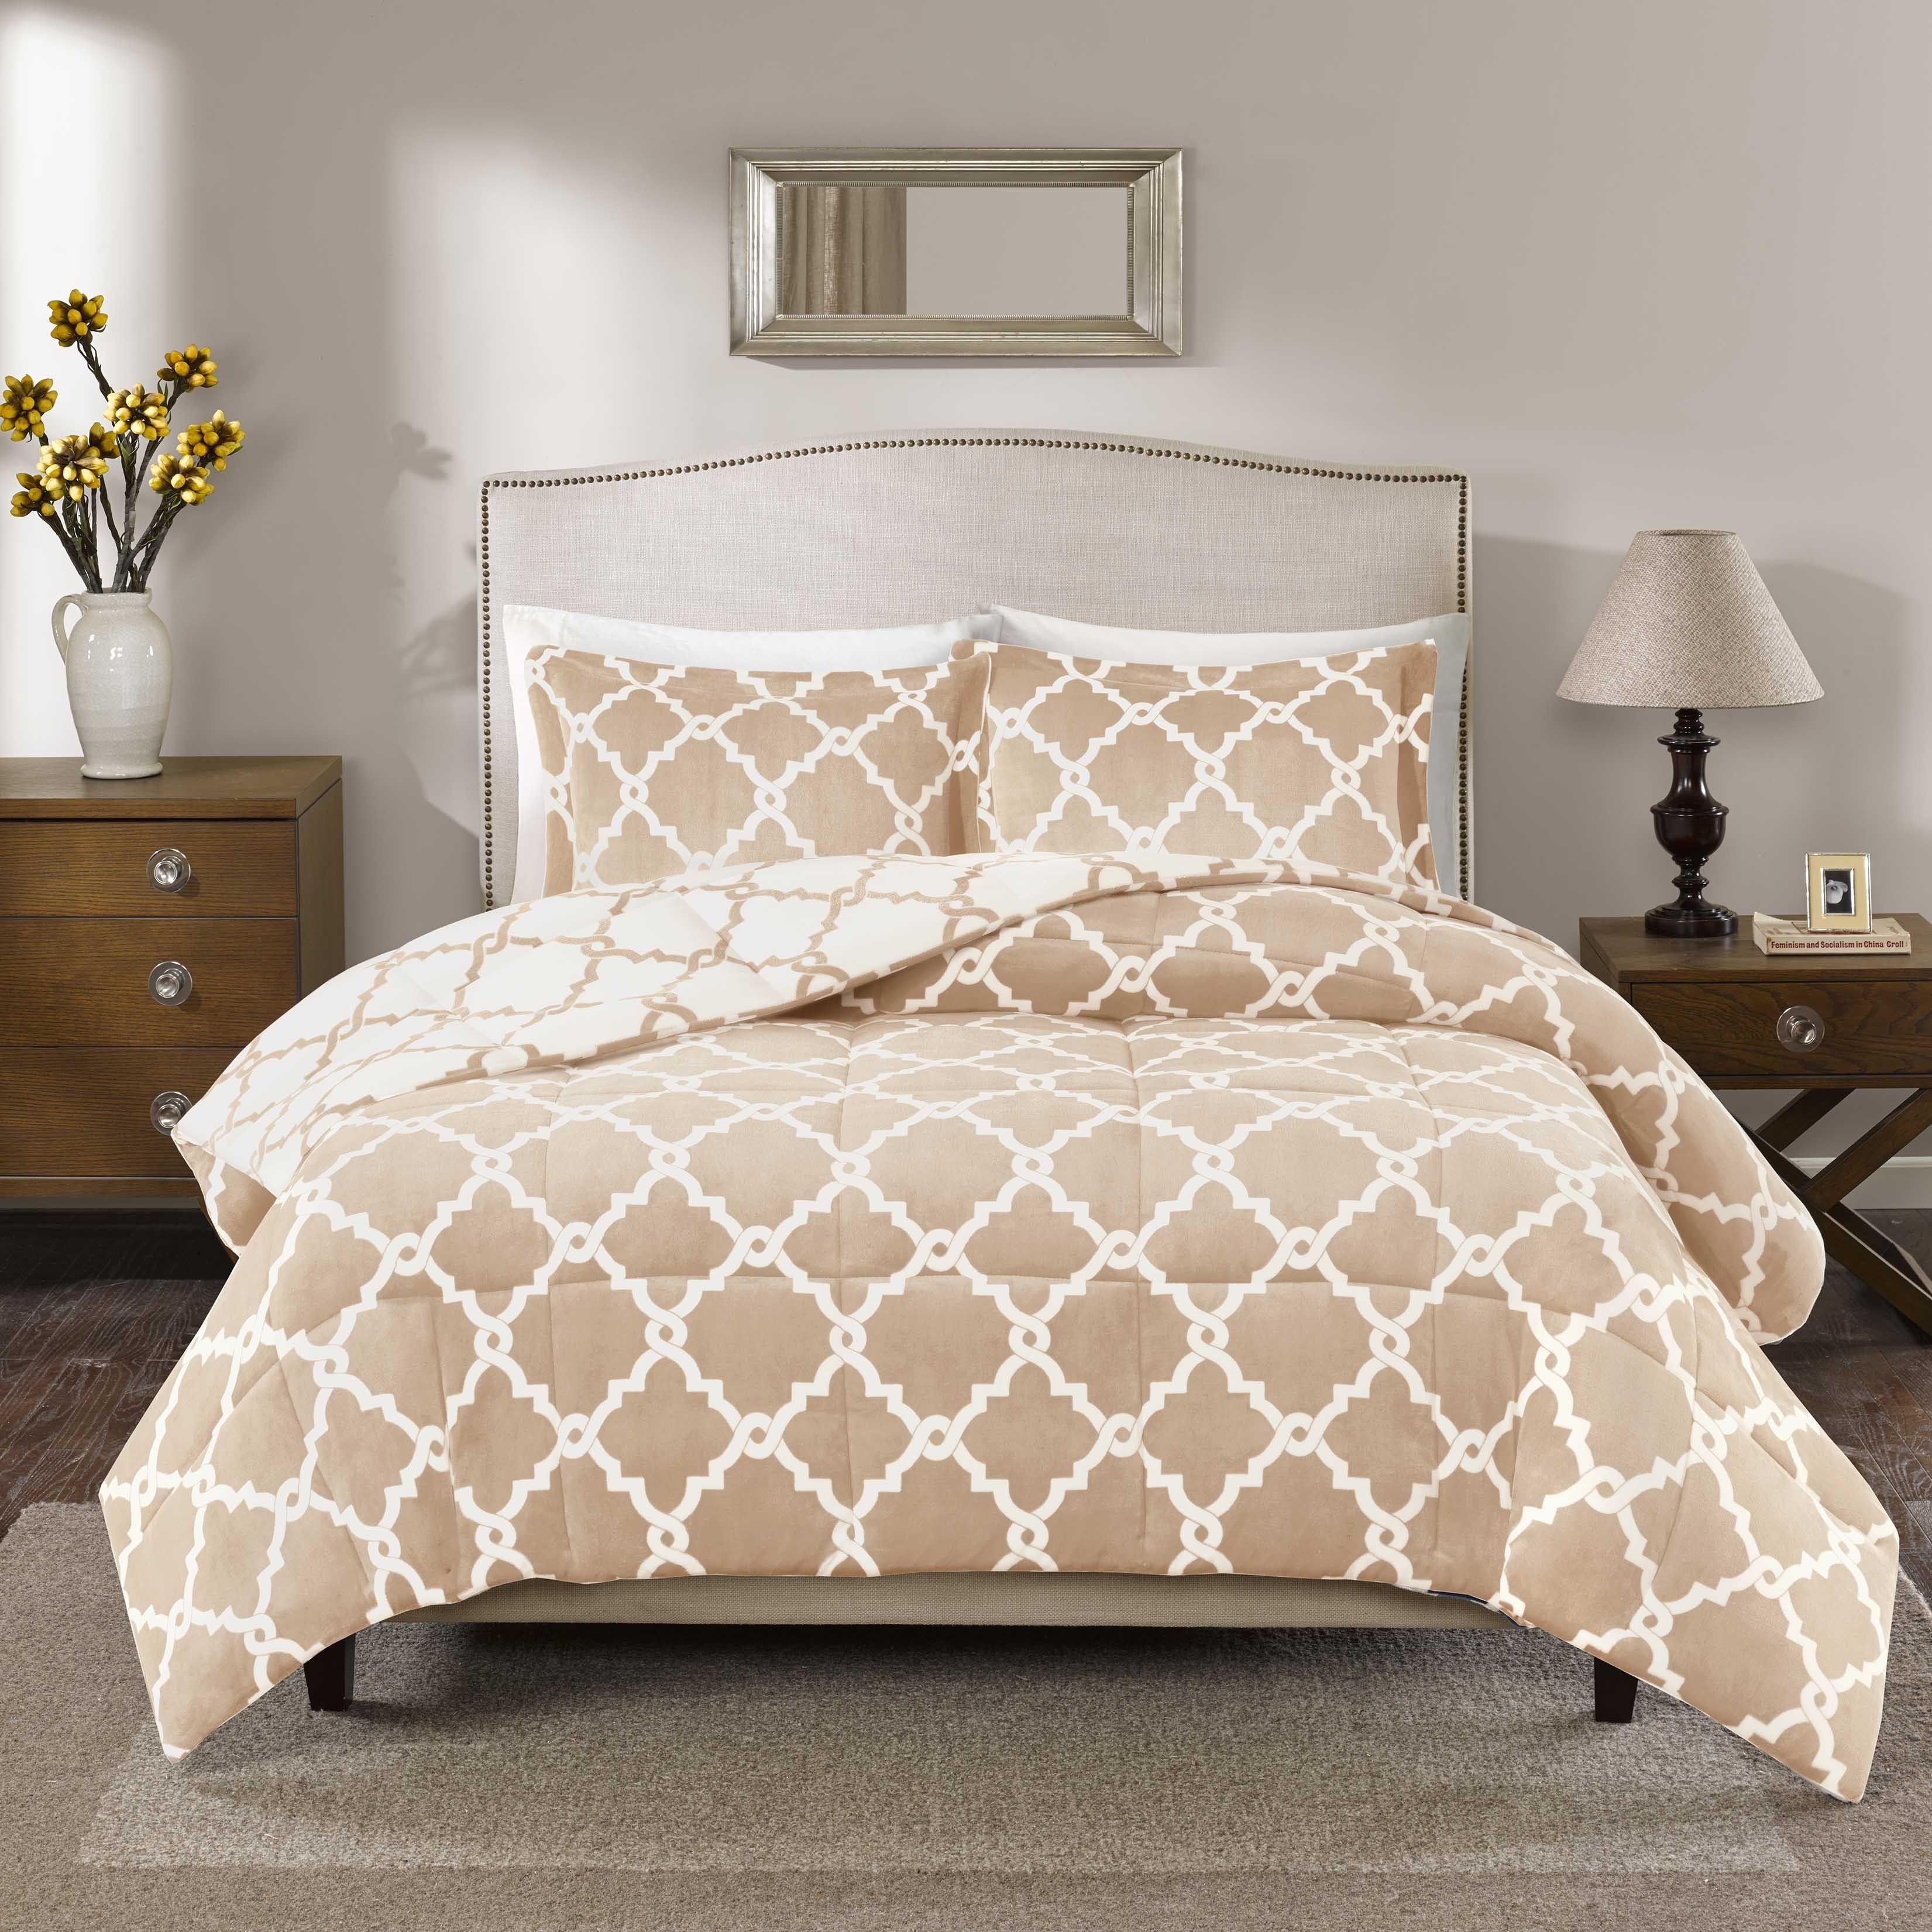 True North by Sleep Philosophy Alston Reversible Plush Down Alternative Comforter Mini Set